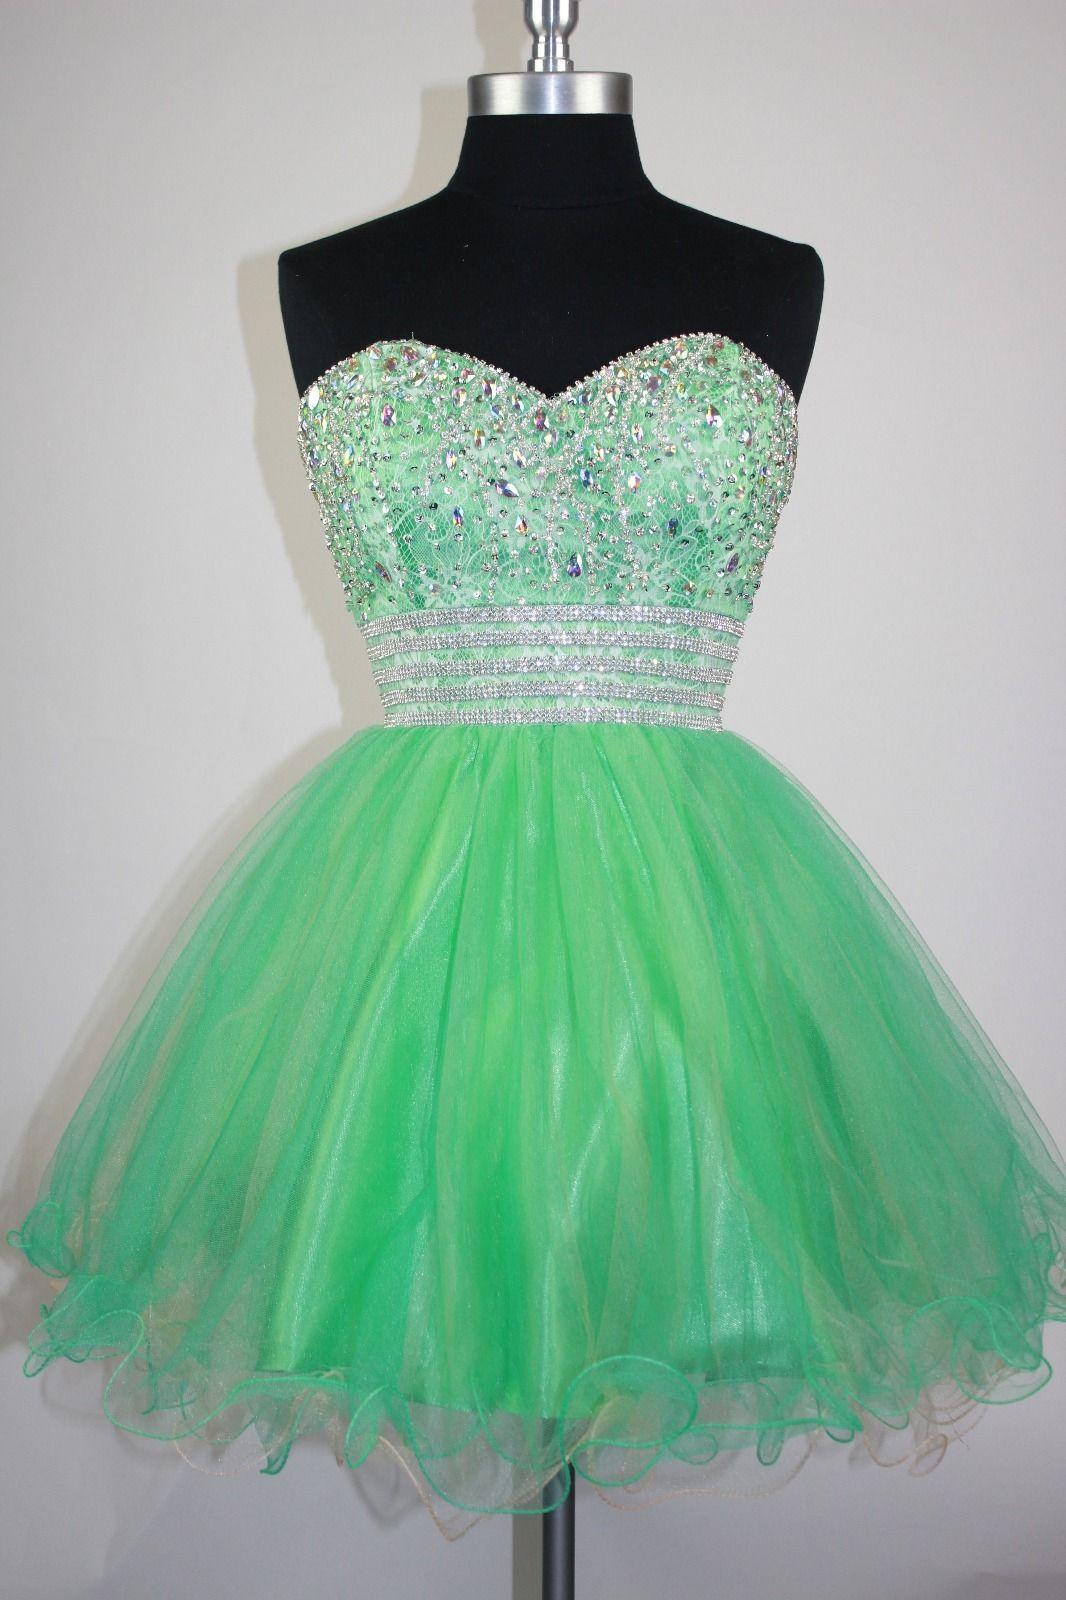 Green prom dresscharming prom dressestulle prom gownelegant prom